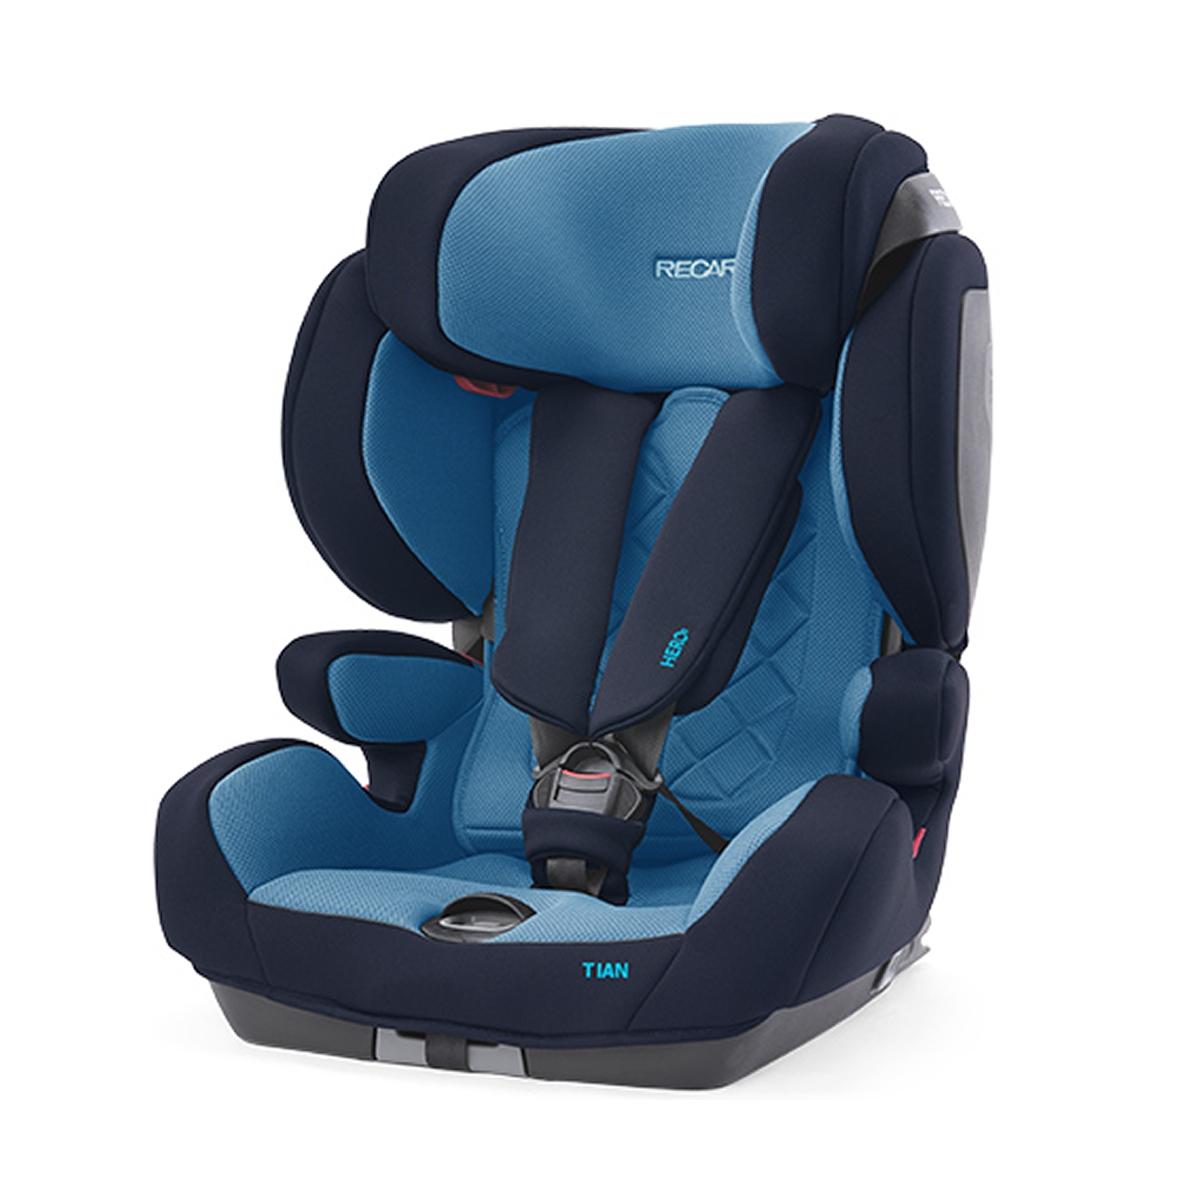 Recaro Tian Core Group 1 Car Seat-Xenon Blue